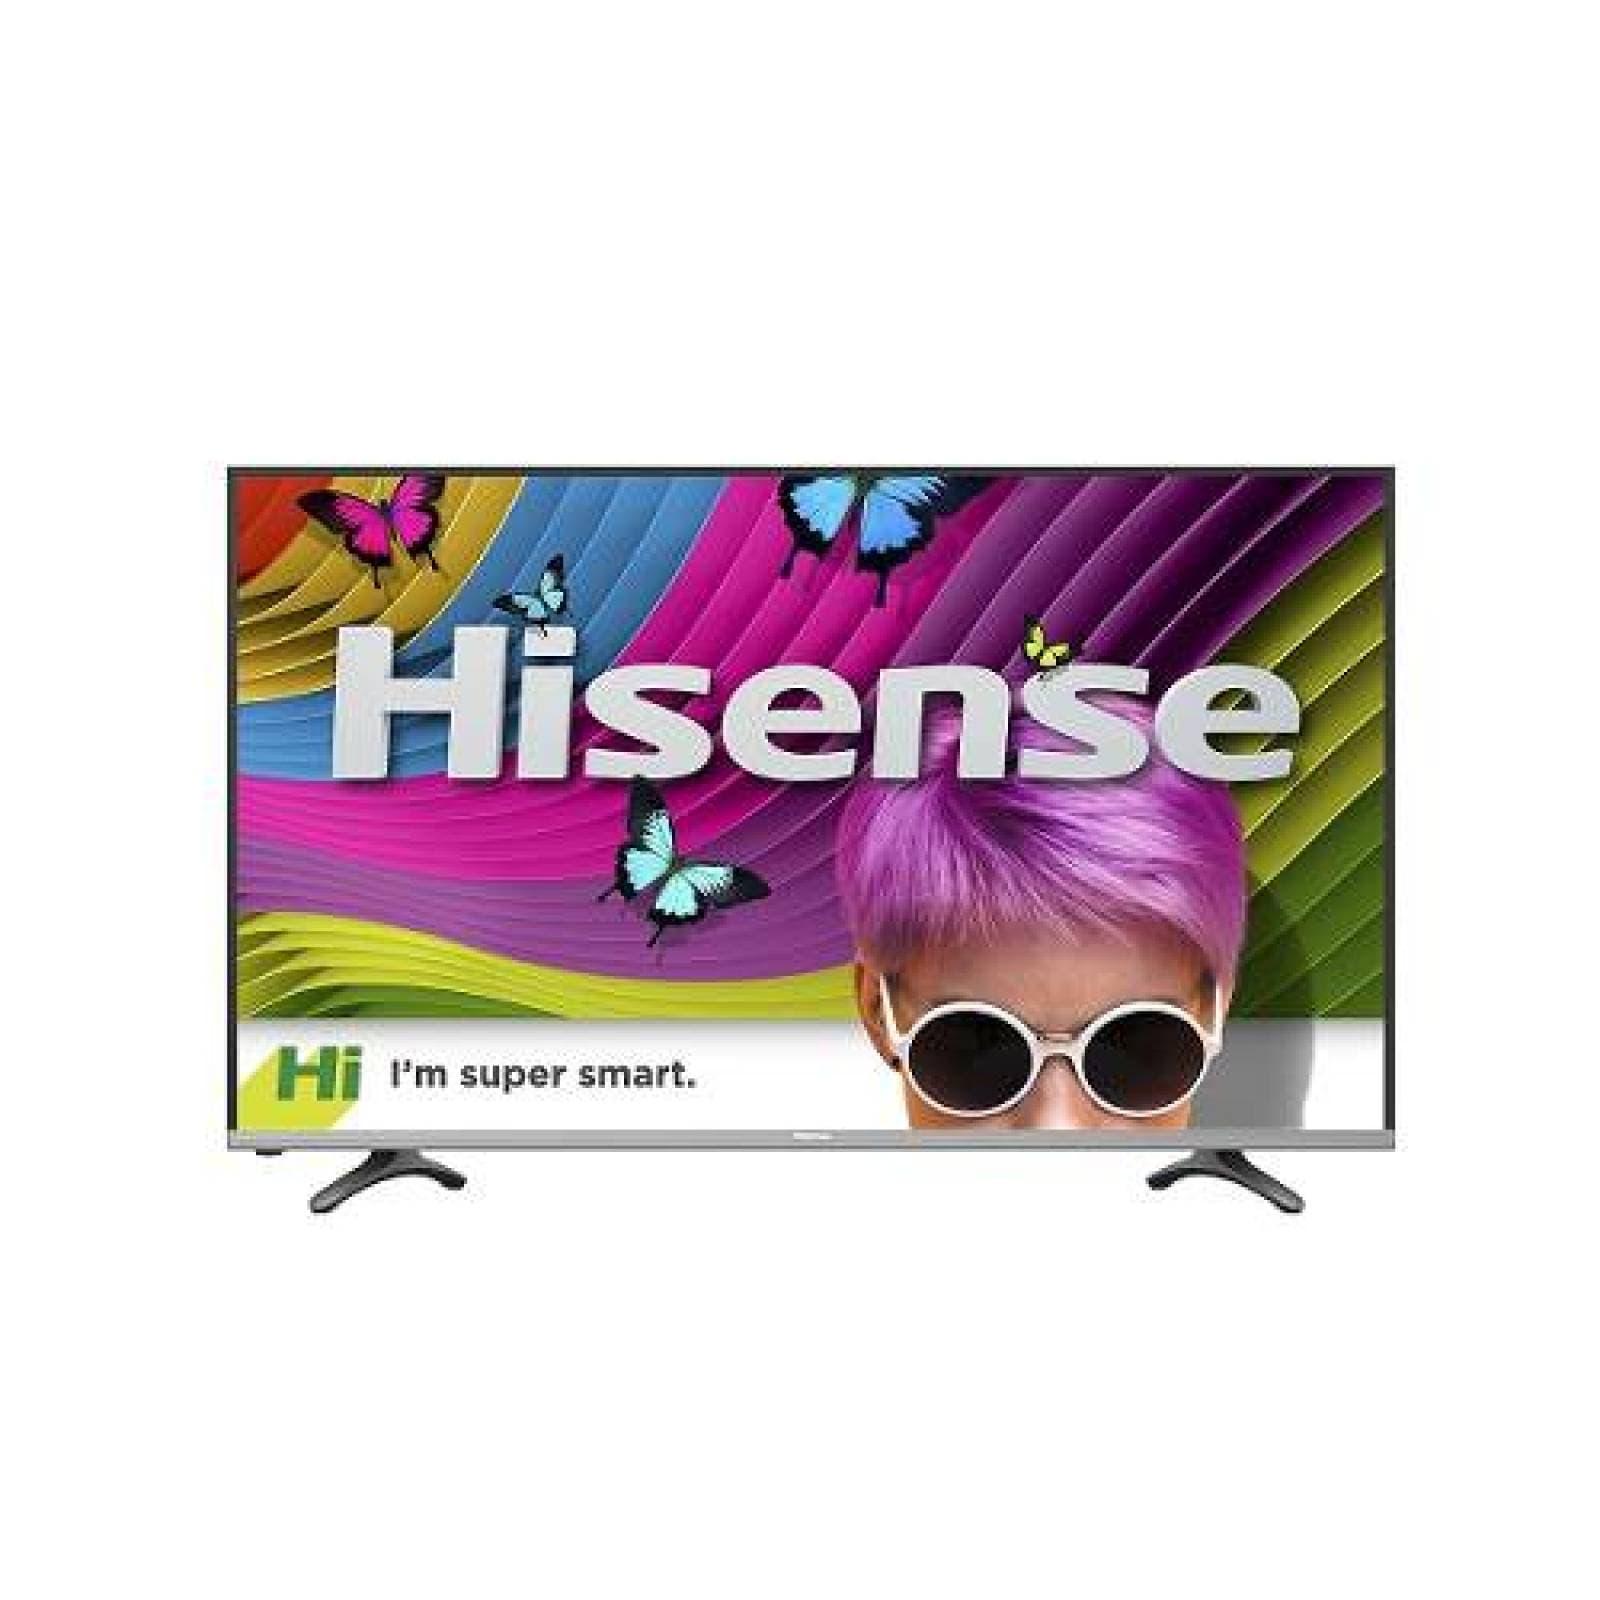 "Pantalla Led Smart Tv 50"" 4K 60Hz Hisense Reacondicionado"